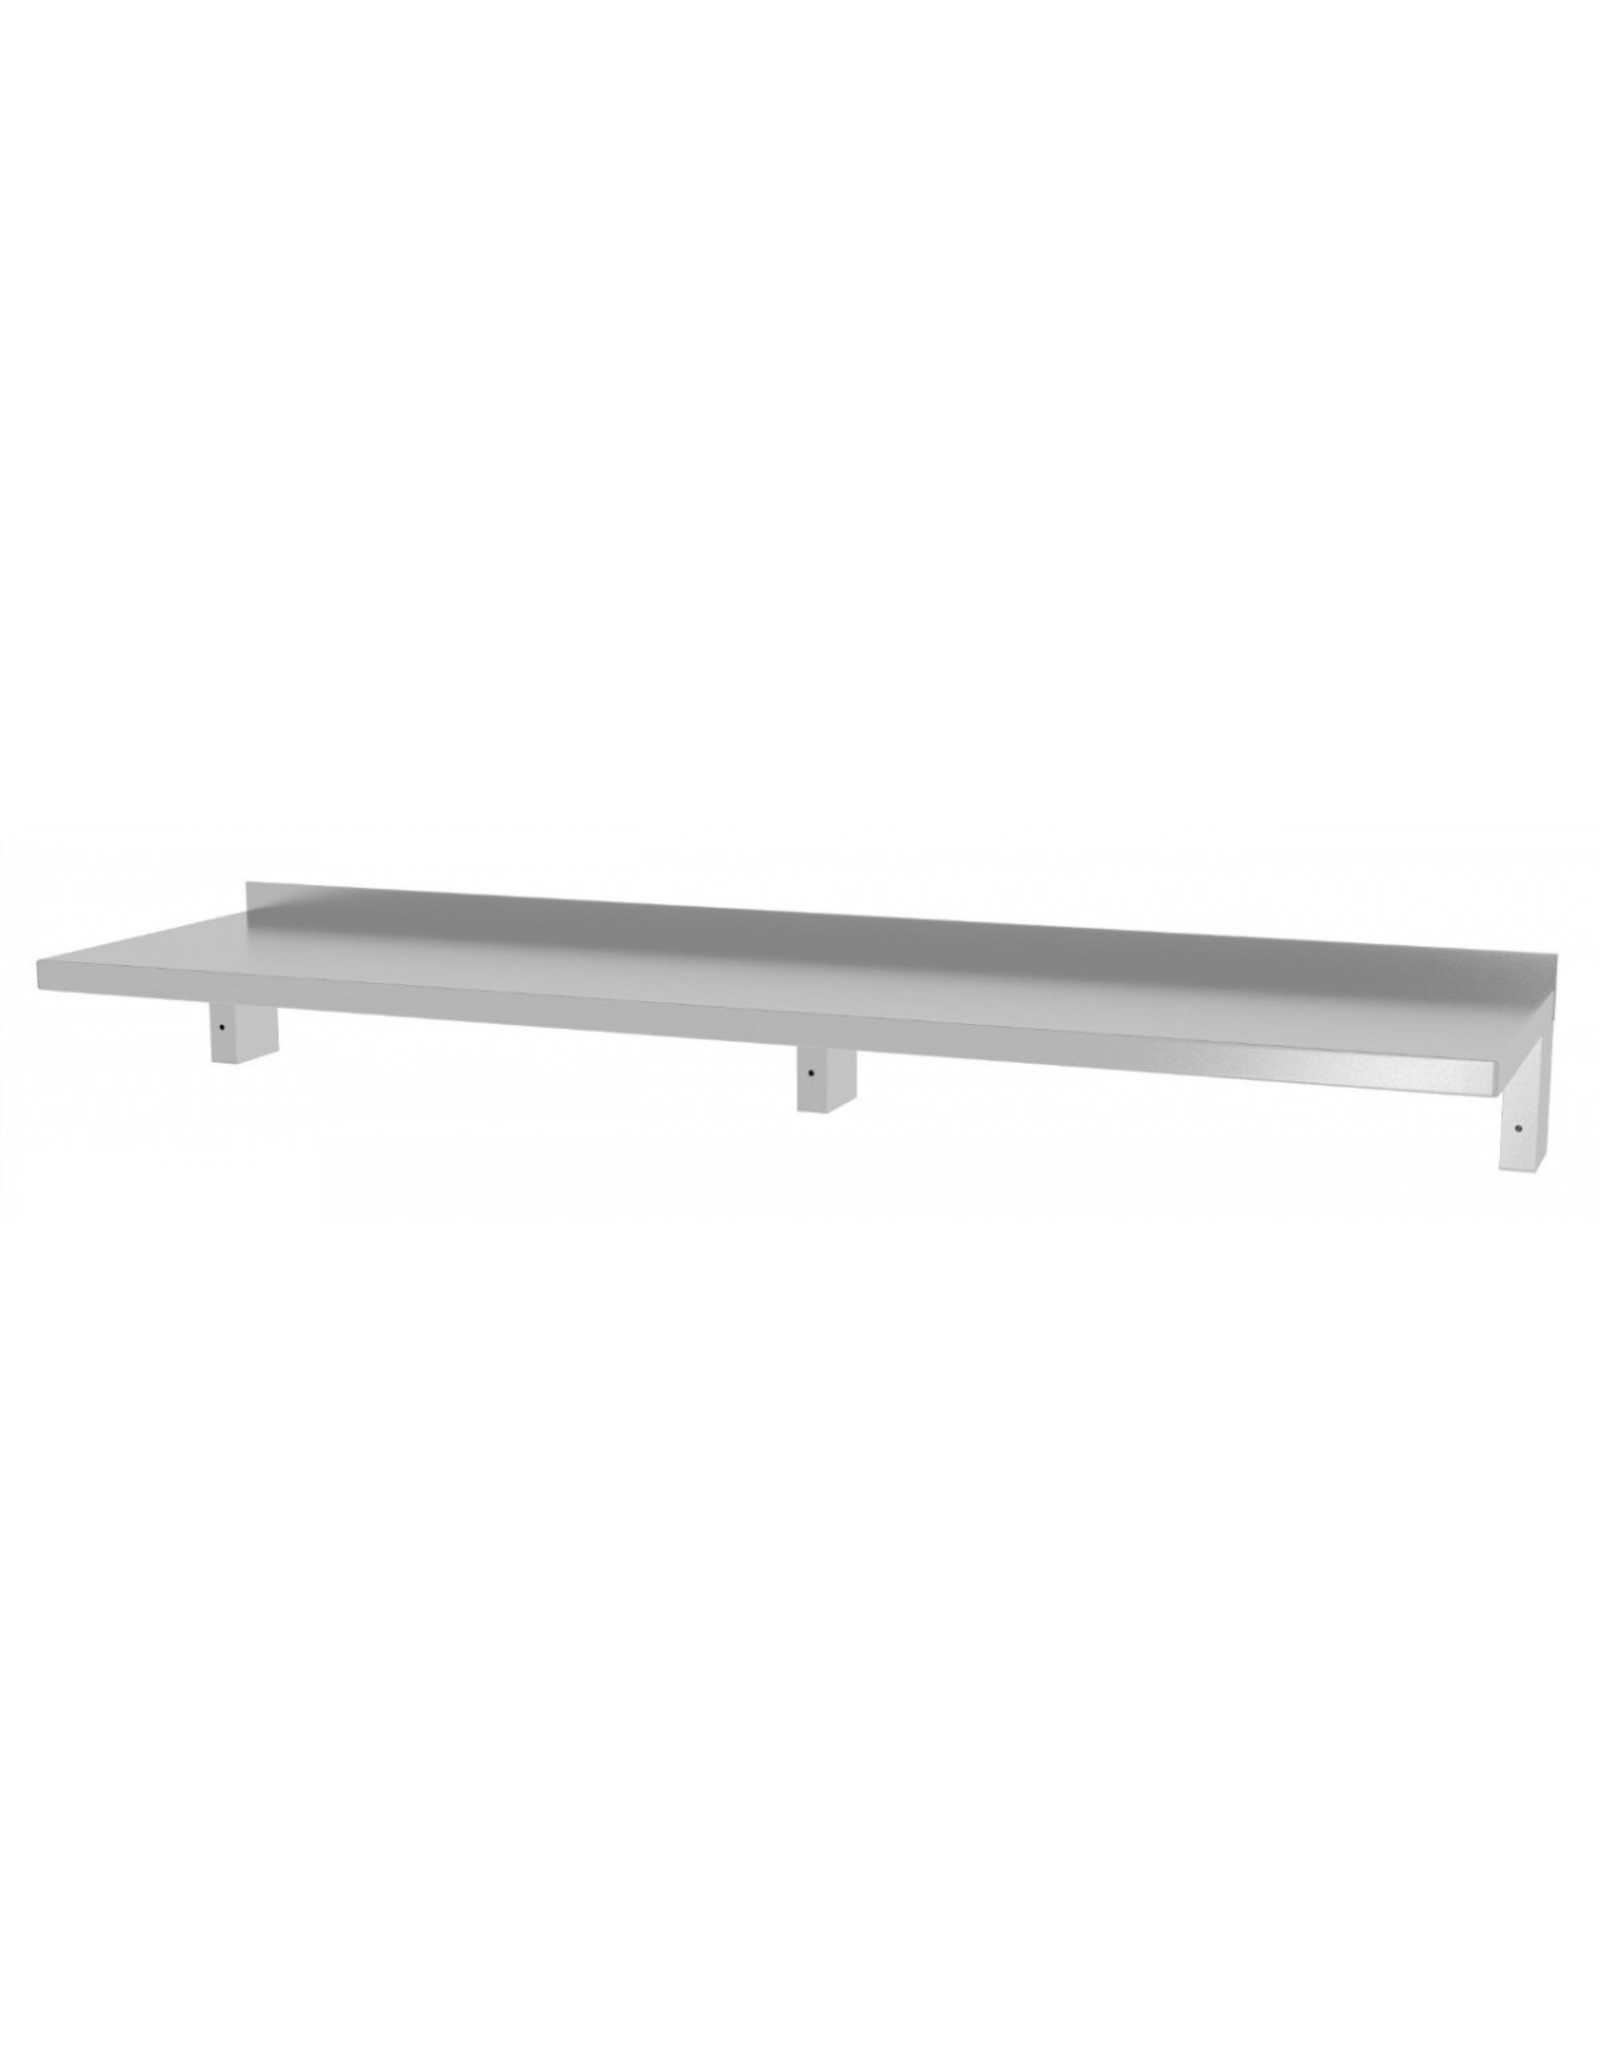 Wandplank verstevigd vast model | met 2 beugels | 1600-2000mm breed | 300 of 400mm diep